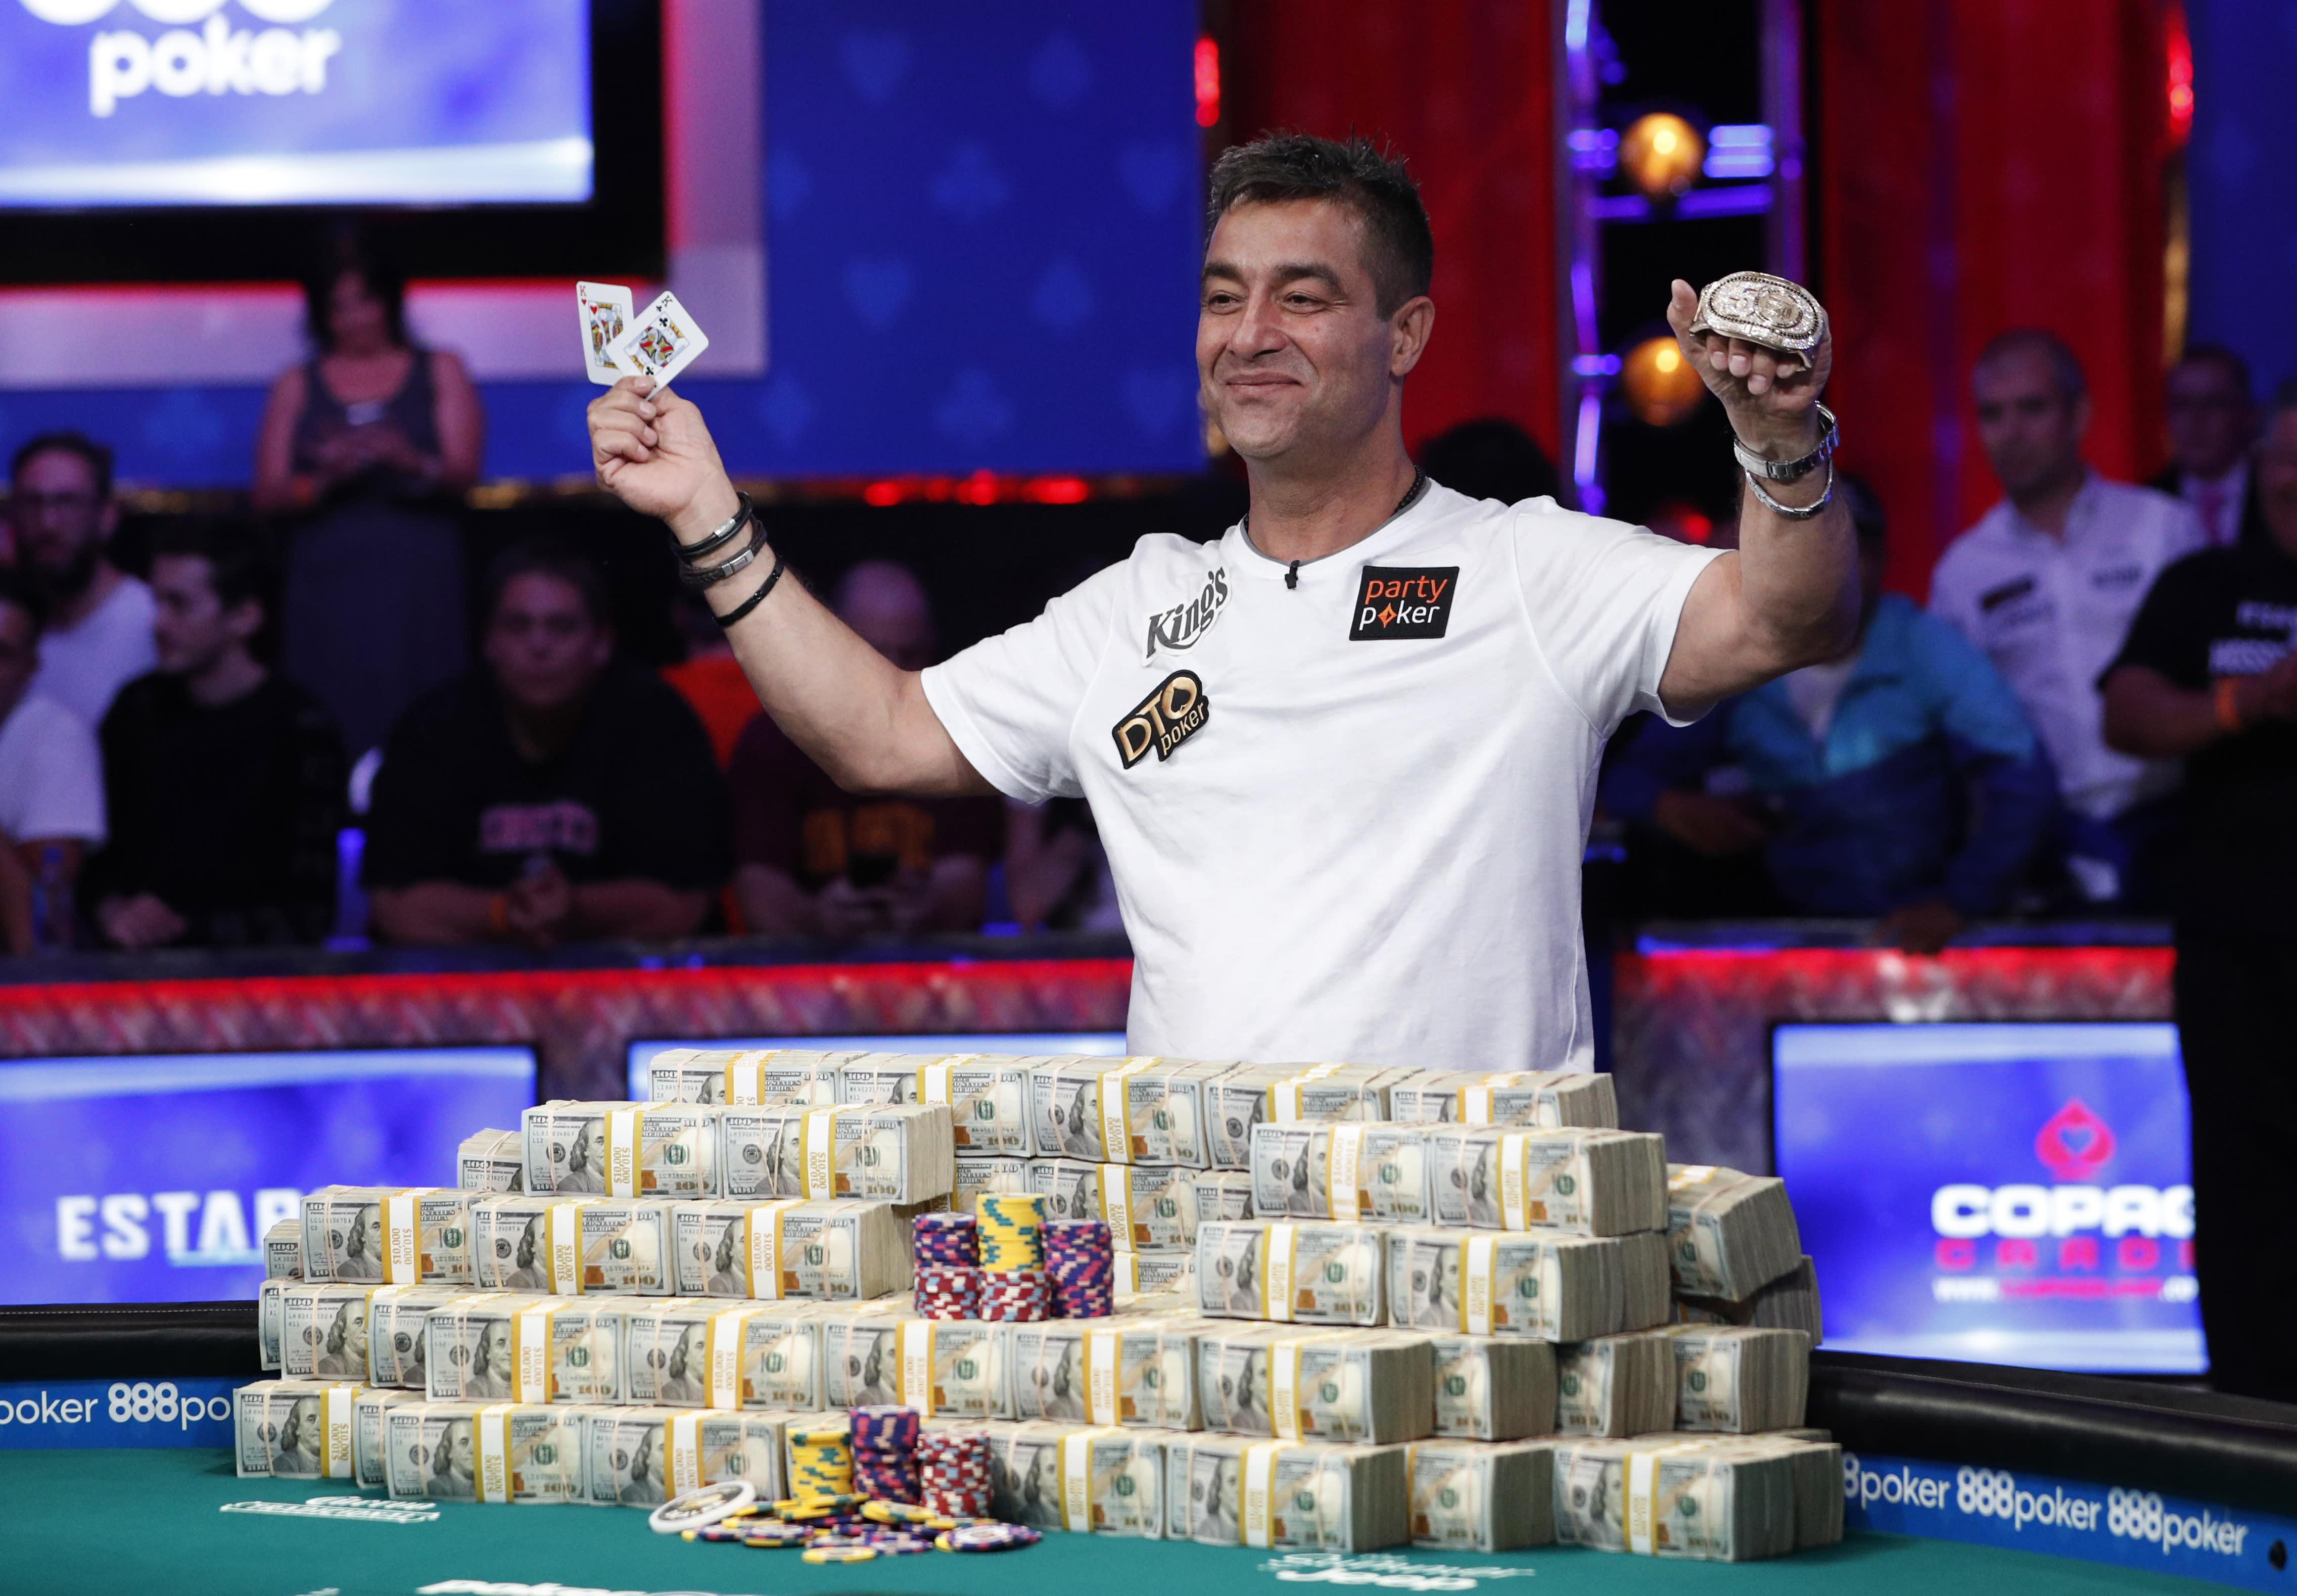 Hossein Ensan Poker